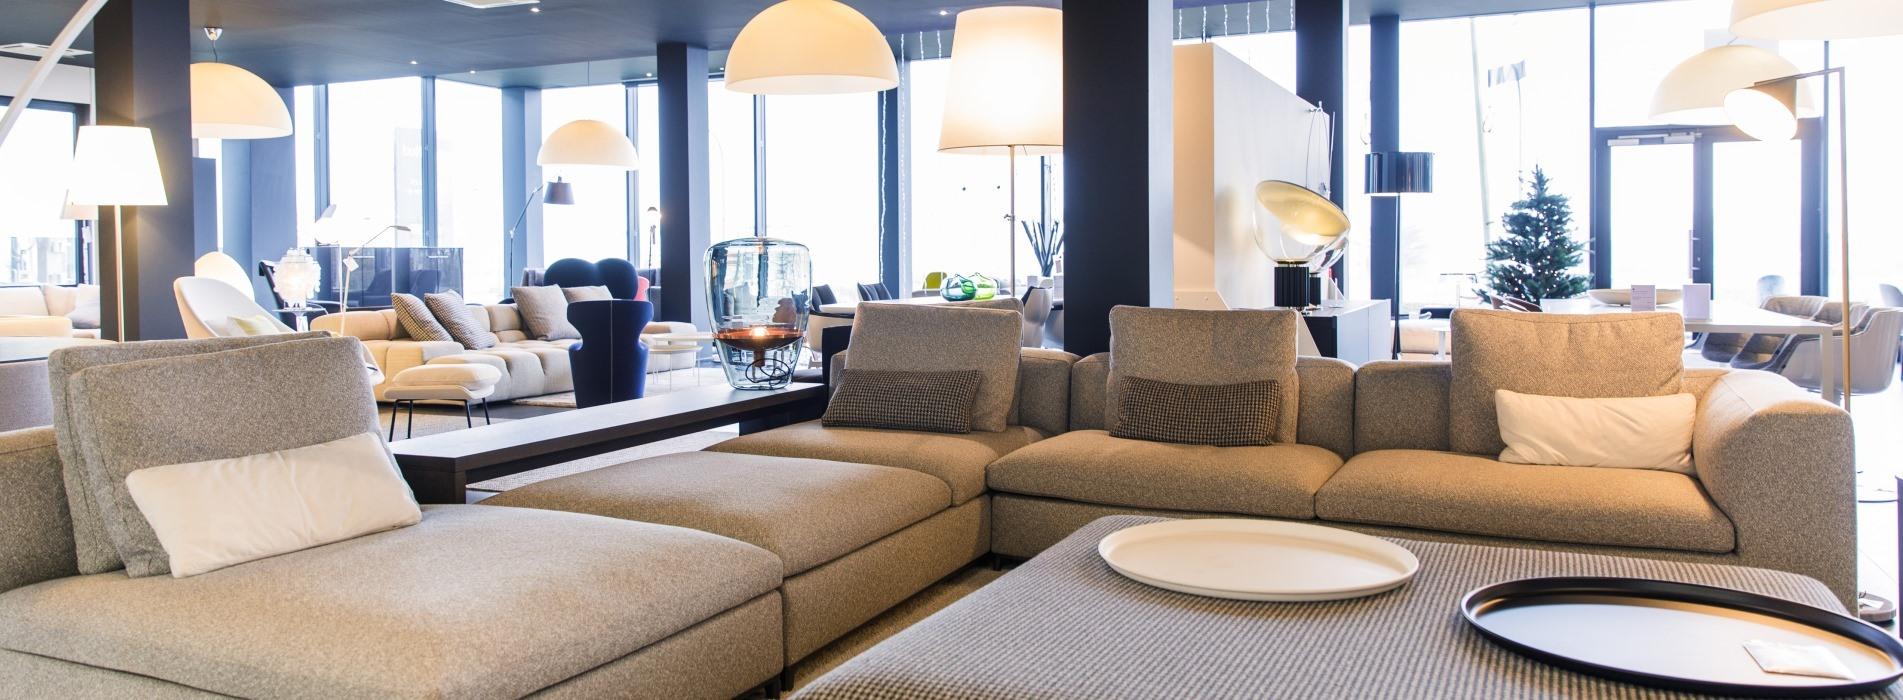 Inside-Concept-Architecture-decoration-d-interieur-showroom-magasin